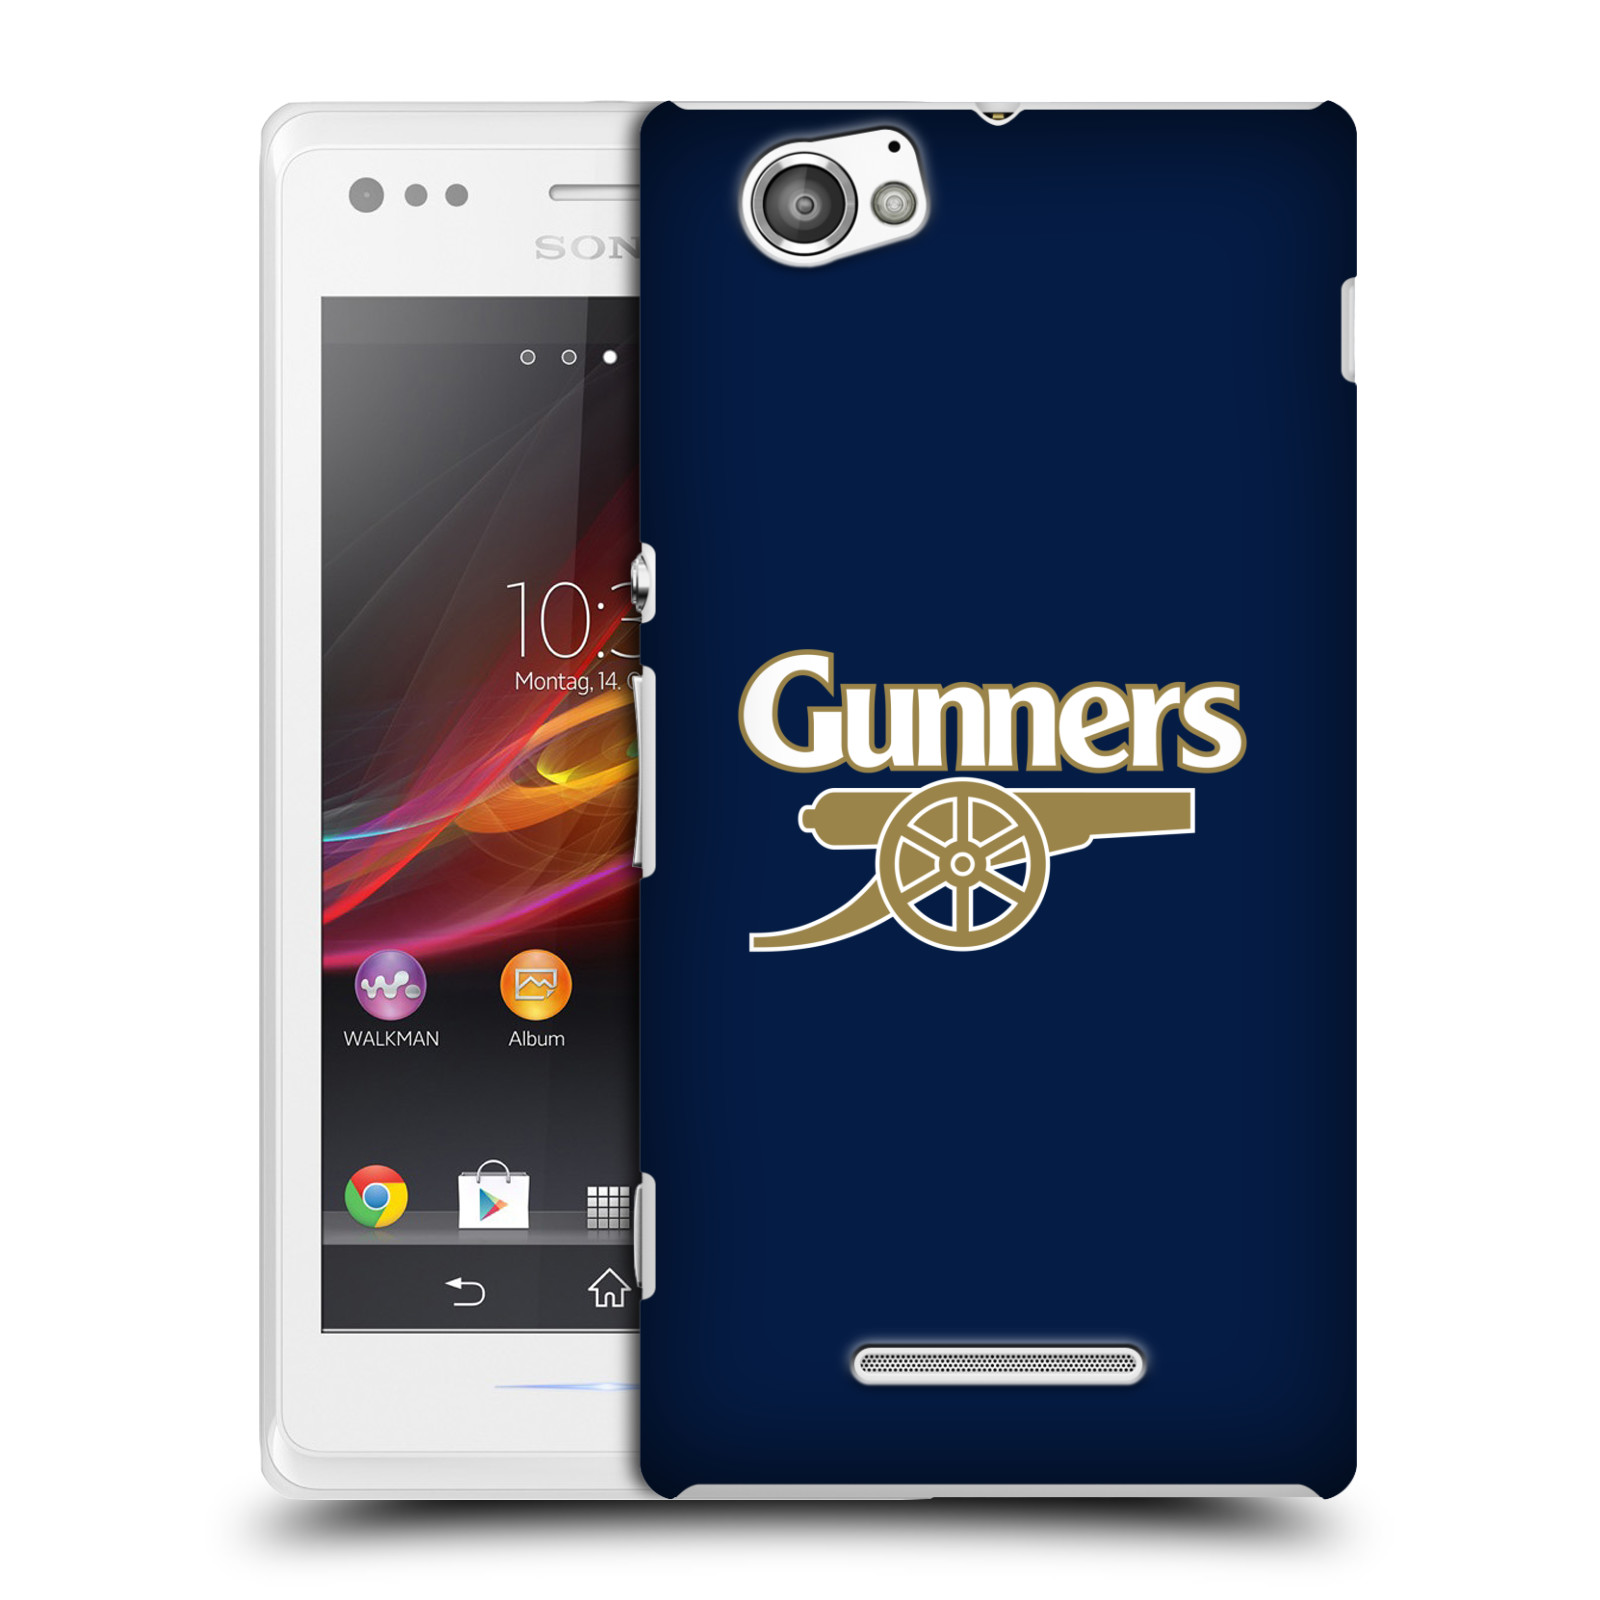 Plastové pouzdro na mobil Sony Xperia M C1905 - Head Case - Arsenal FC - Gunners